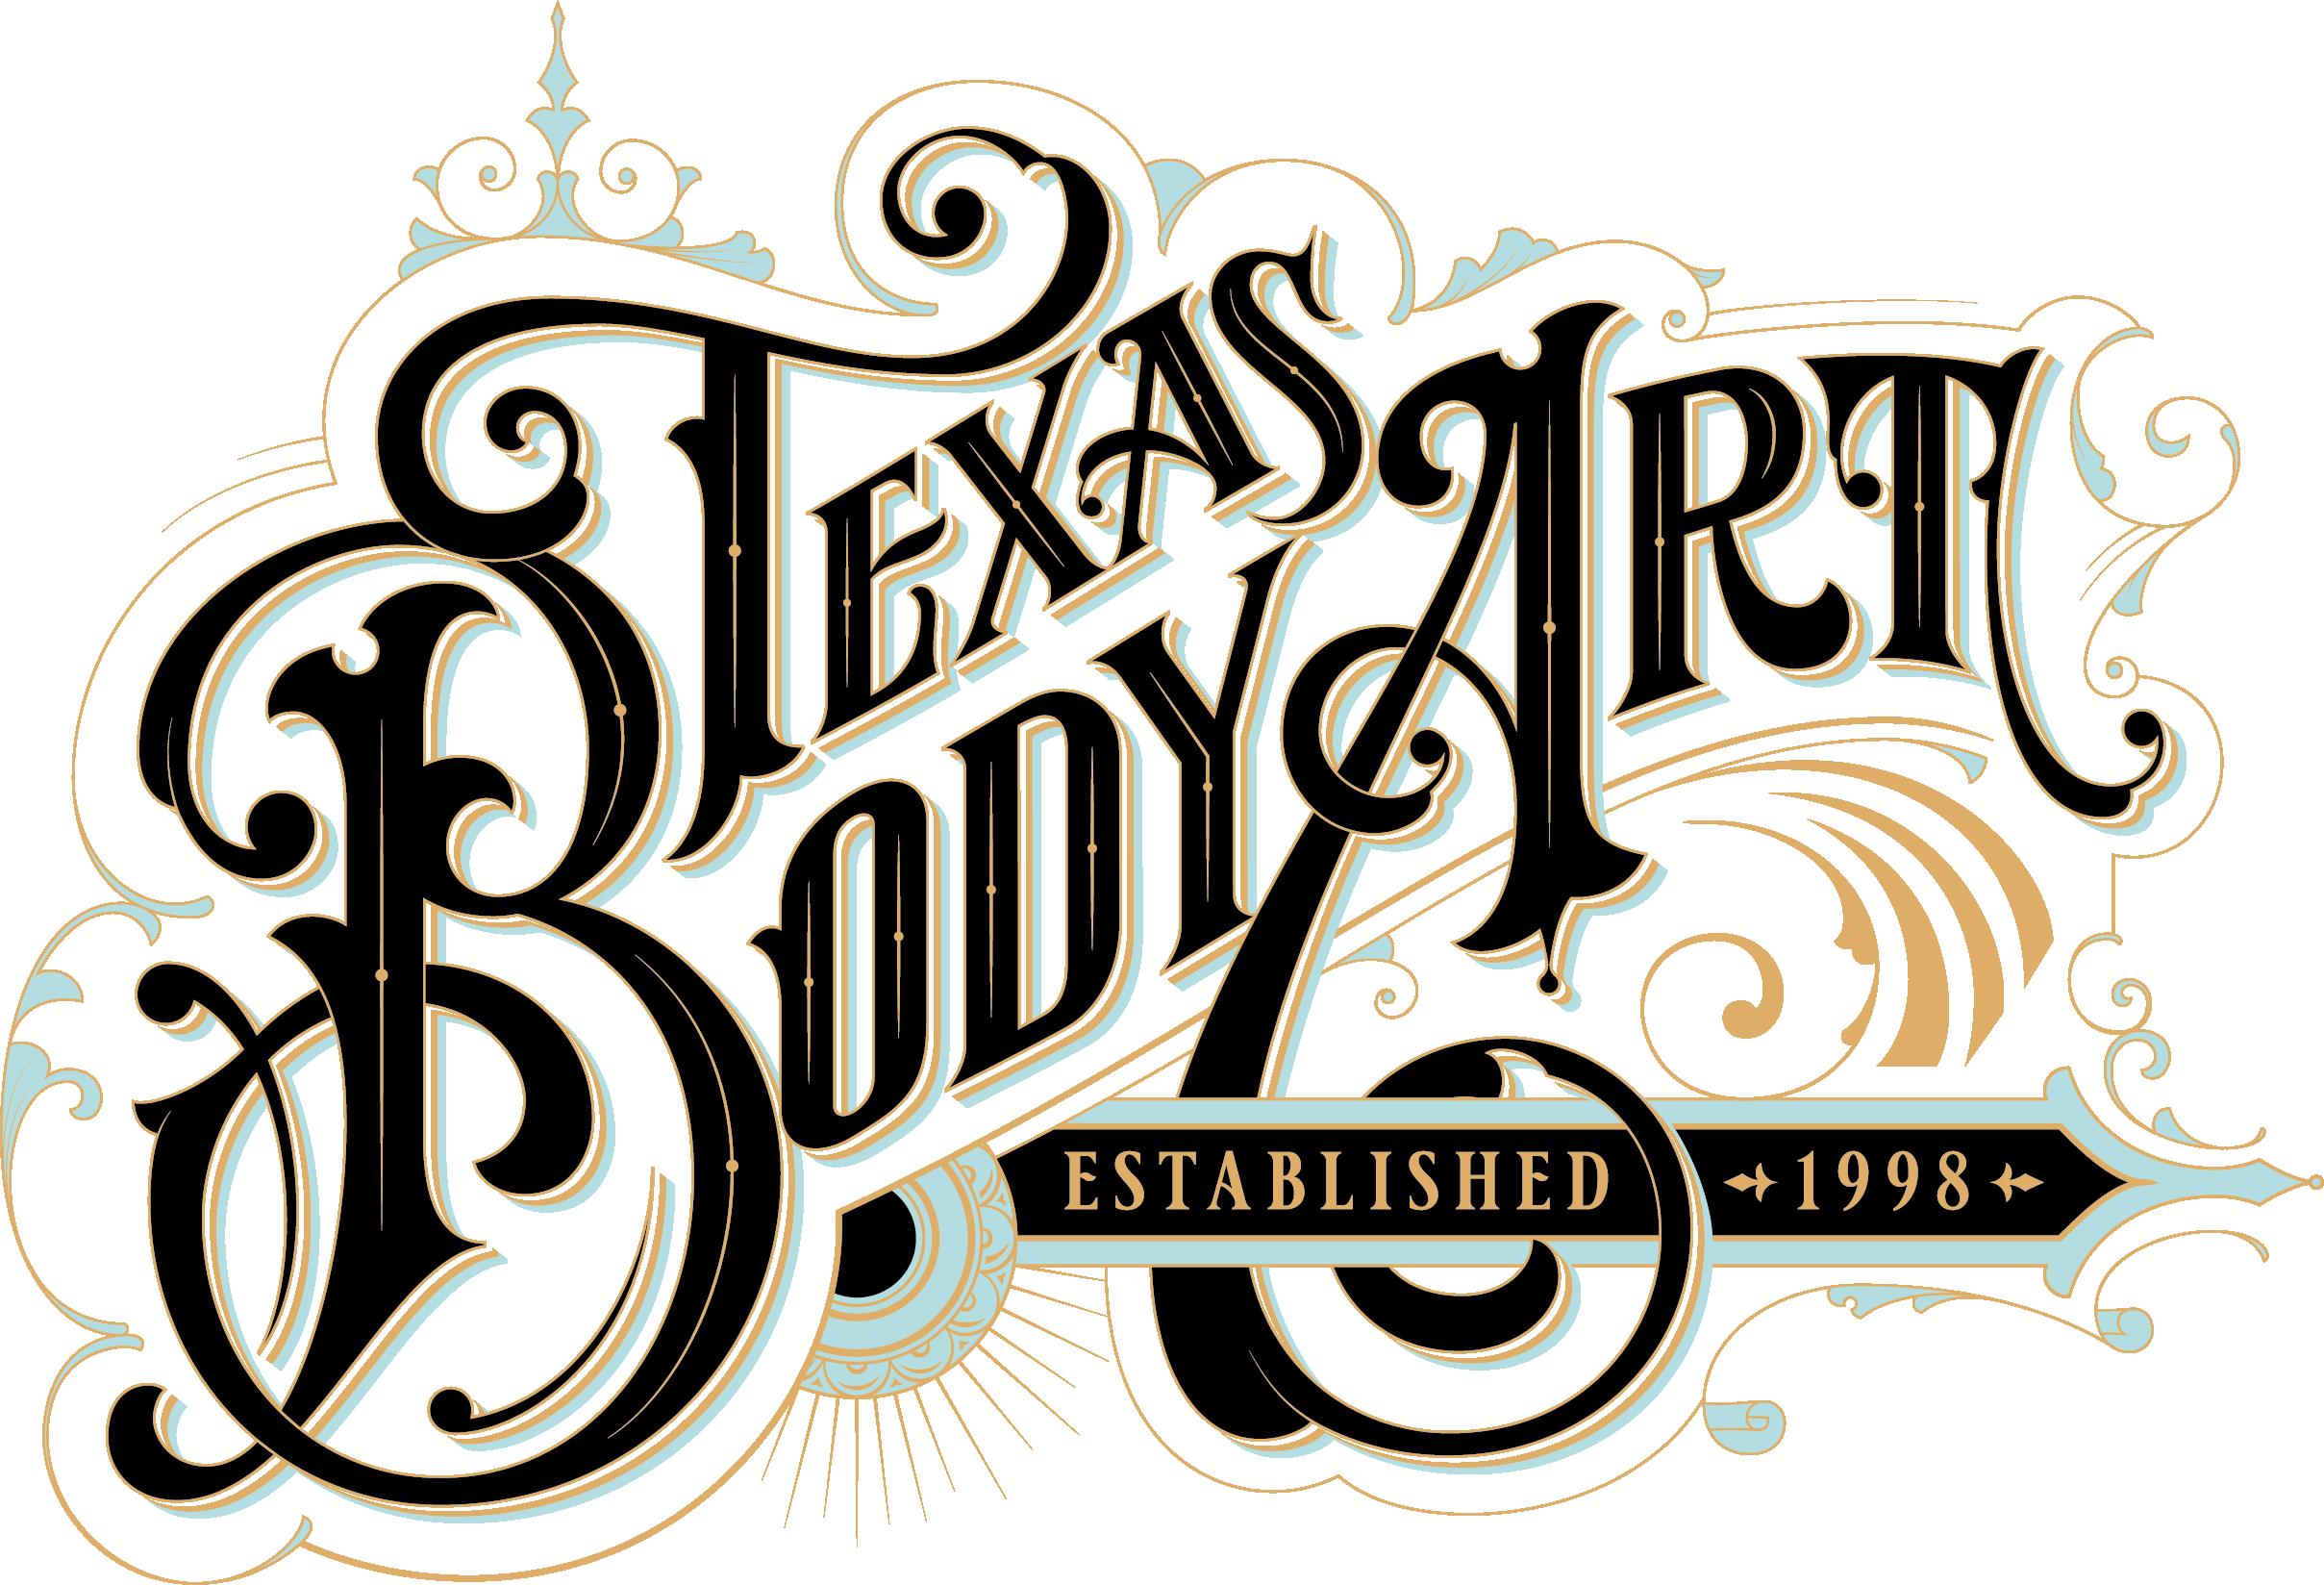 Logo clipart houston texans, Logo houston texans ...